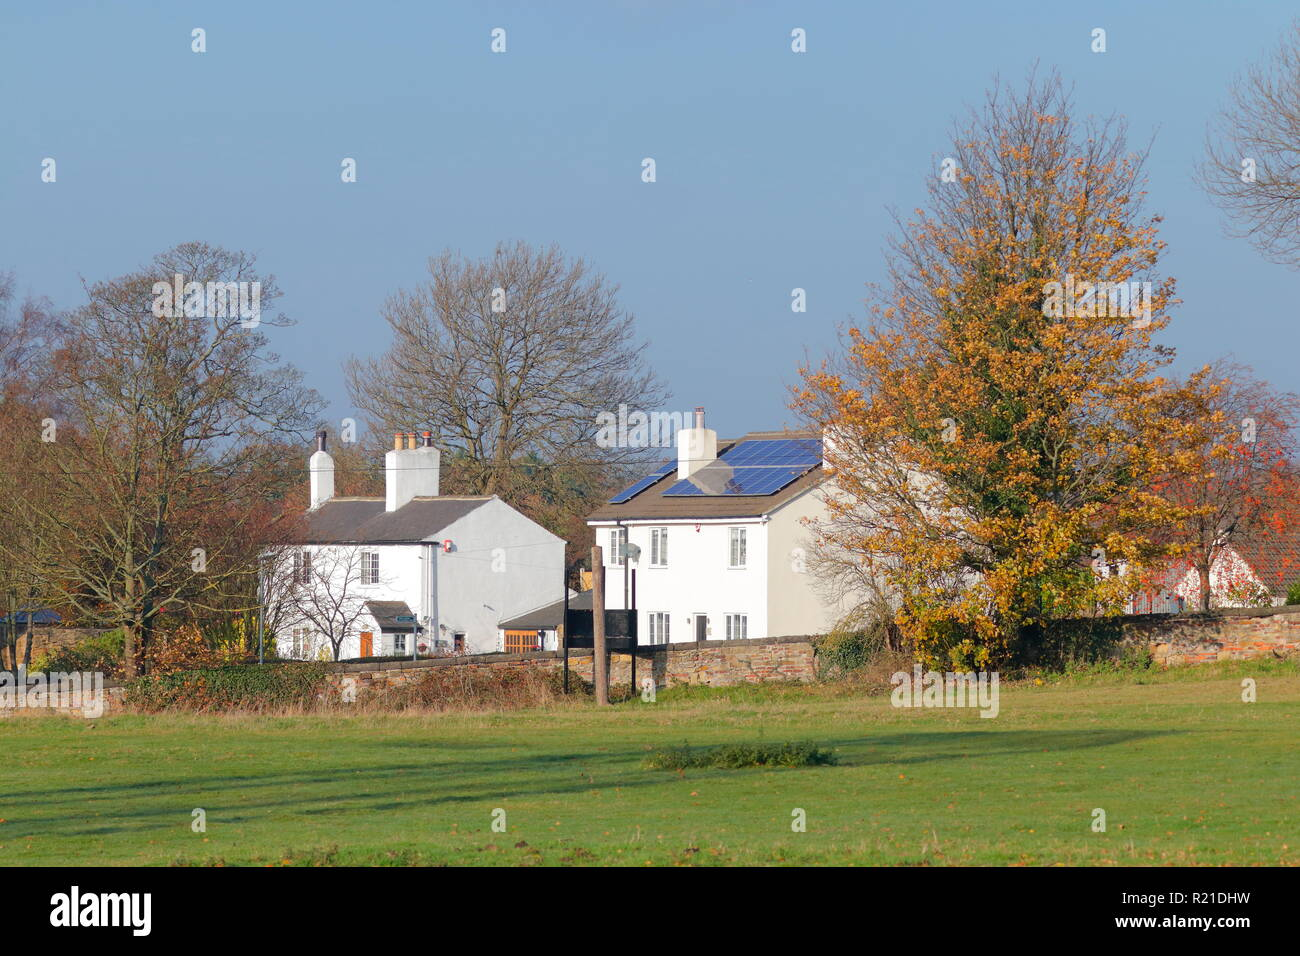 Casas rurales en Swillington con paneles solares Imagen De Stock